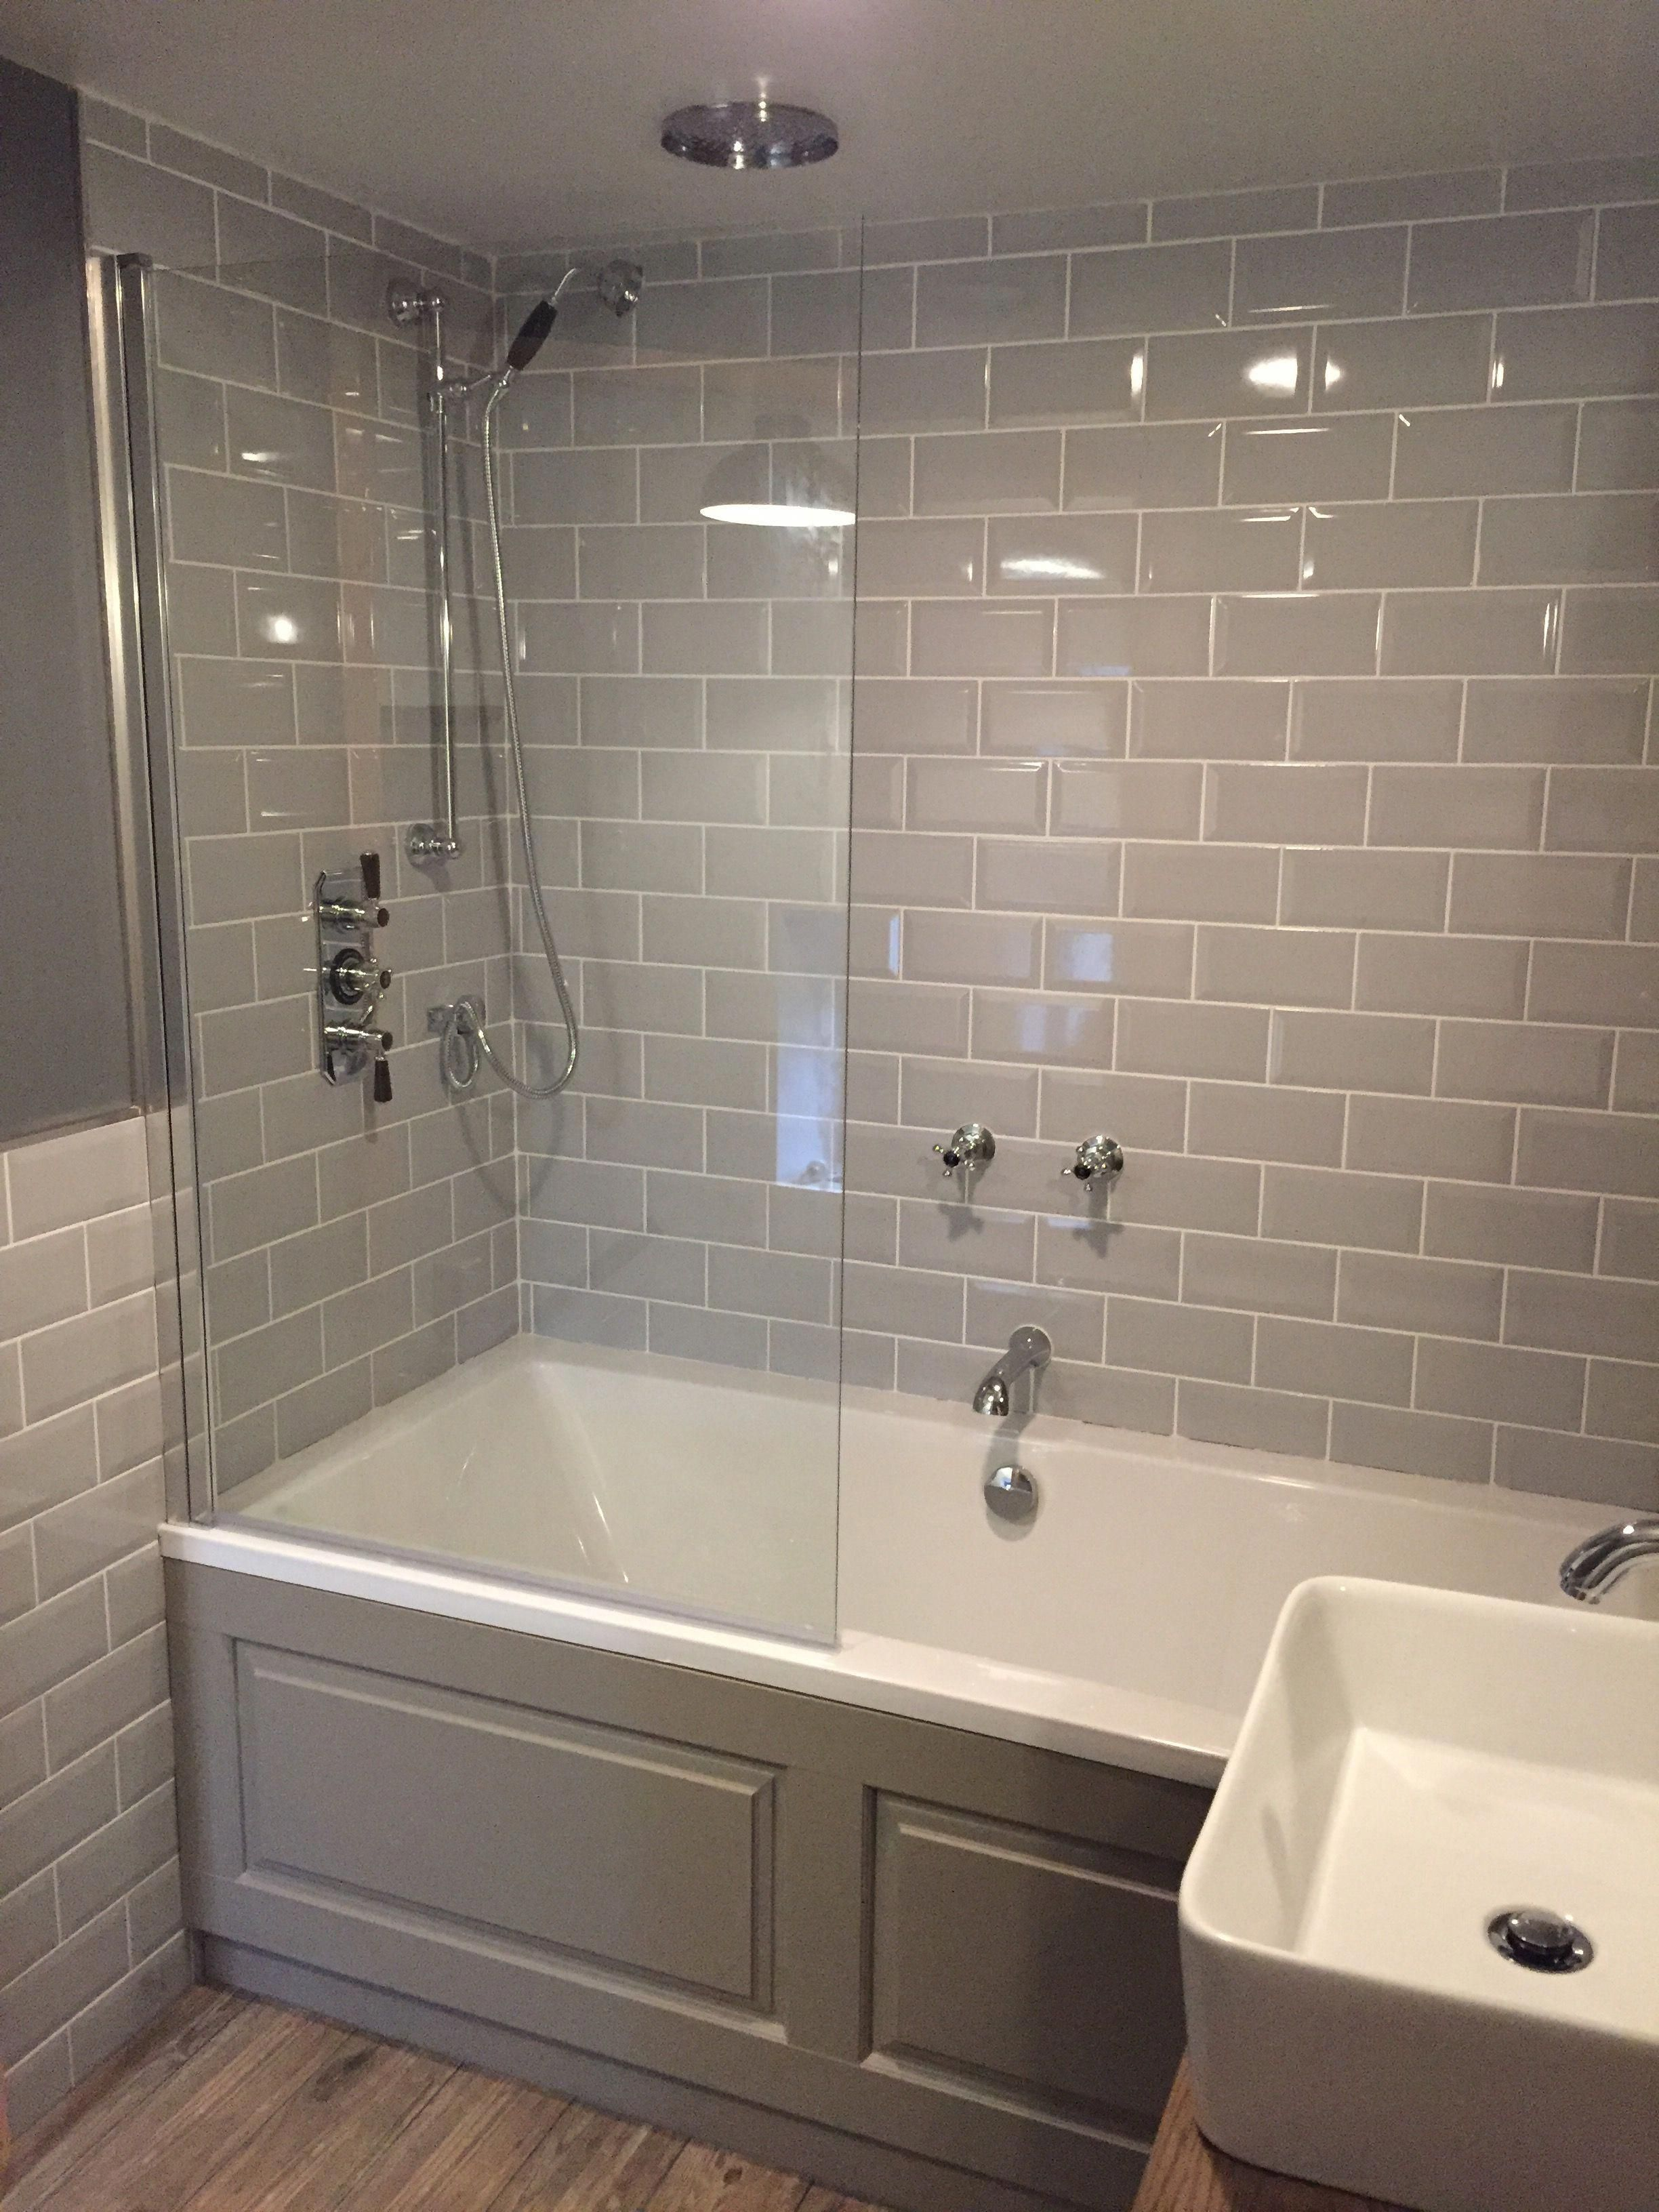 Whether You Re Preparing A Bathroom Renovation Or Presently Renovating Katydidandkid Com Has Renovatio Bathroom Remodel Shower Shower Remodel Simple Bathroom